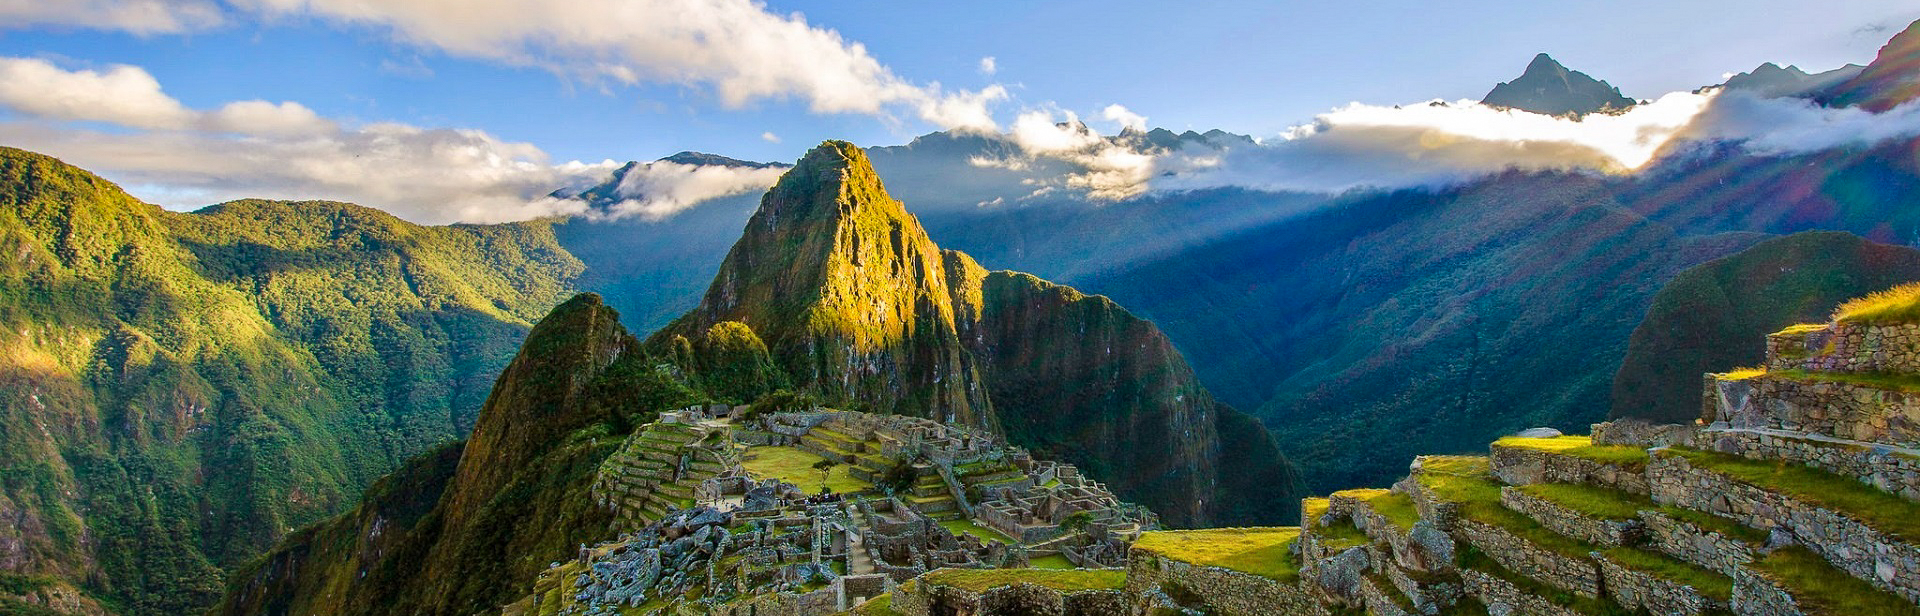 Trek Machu Picchu with Earth's Edge